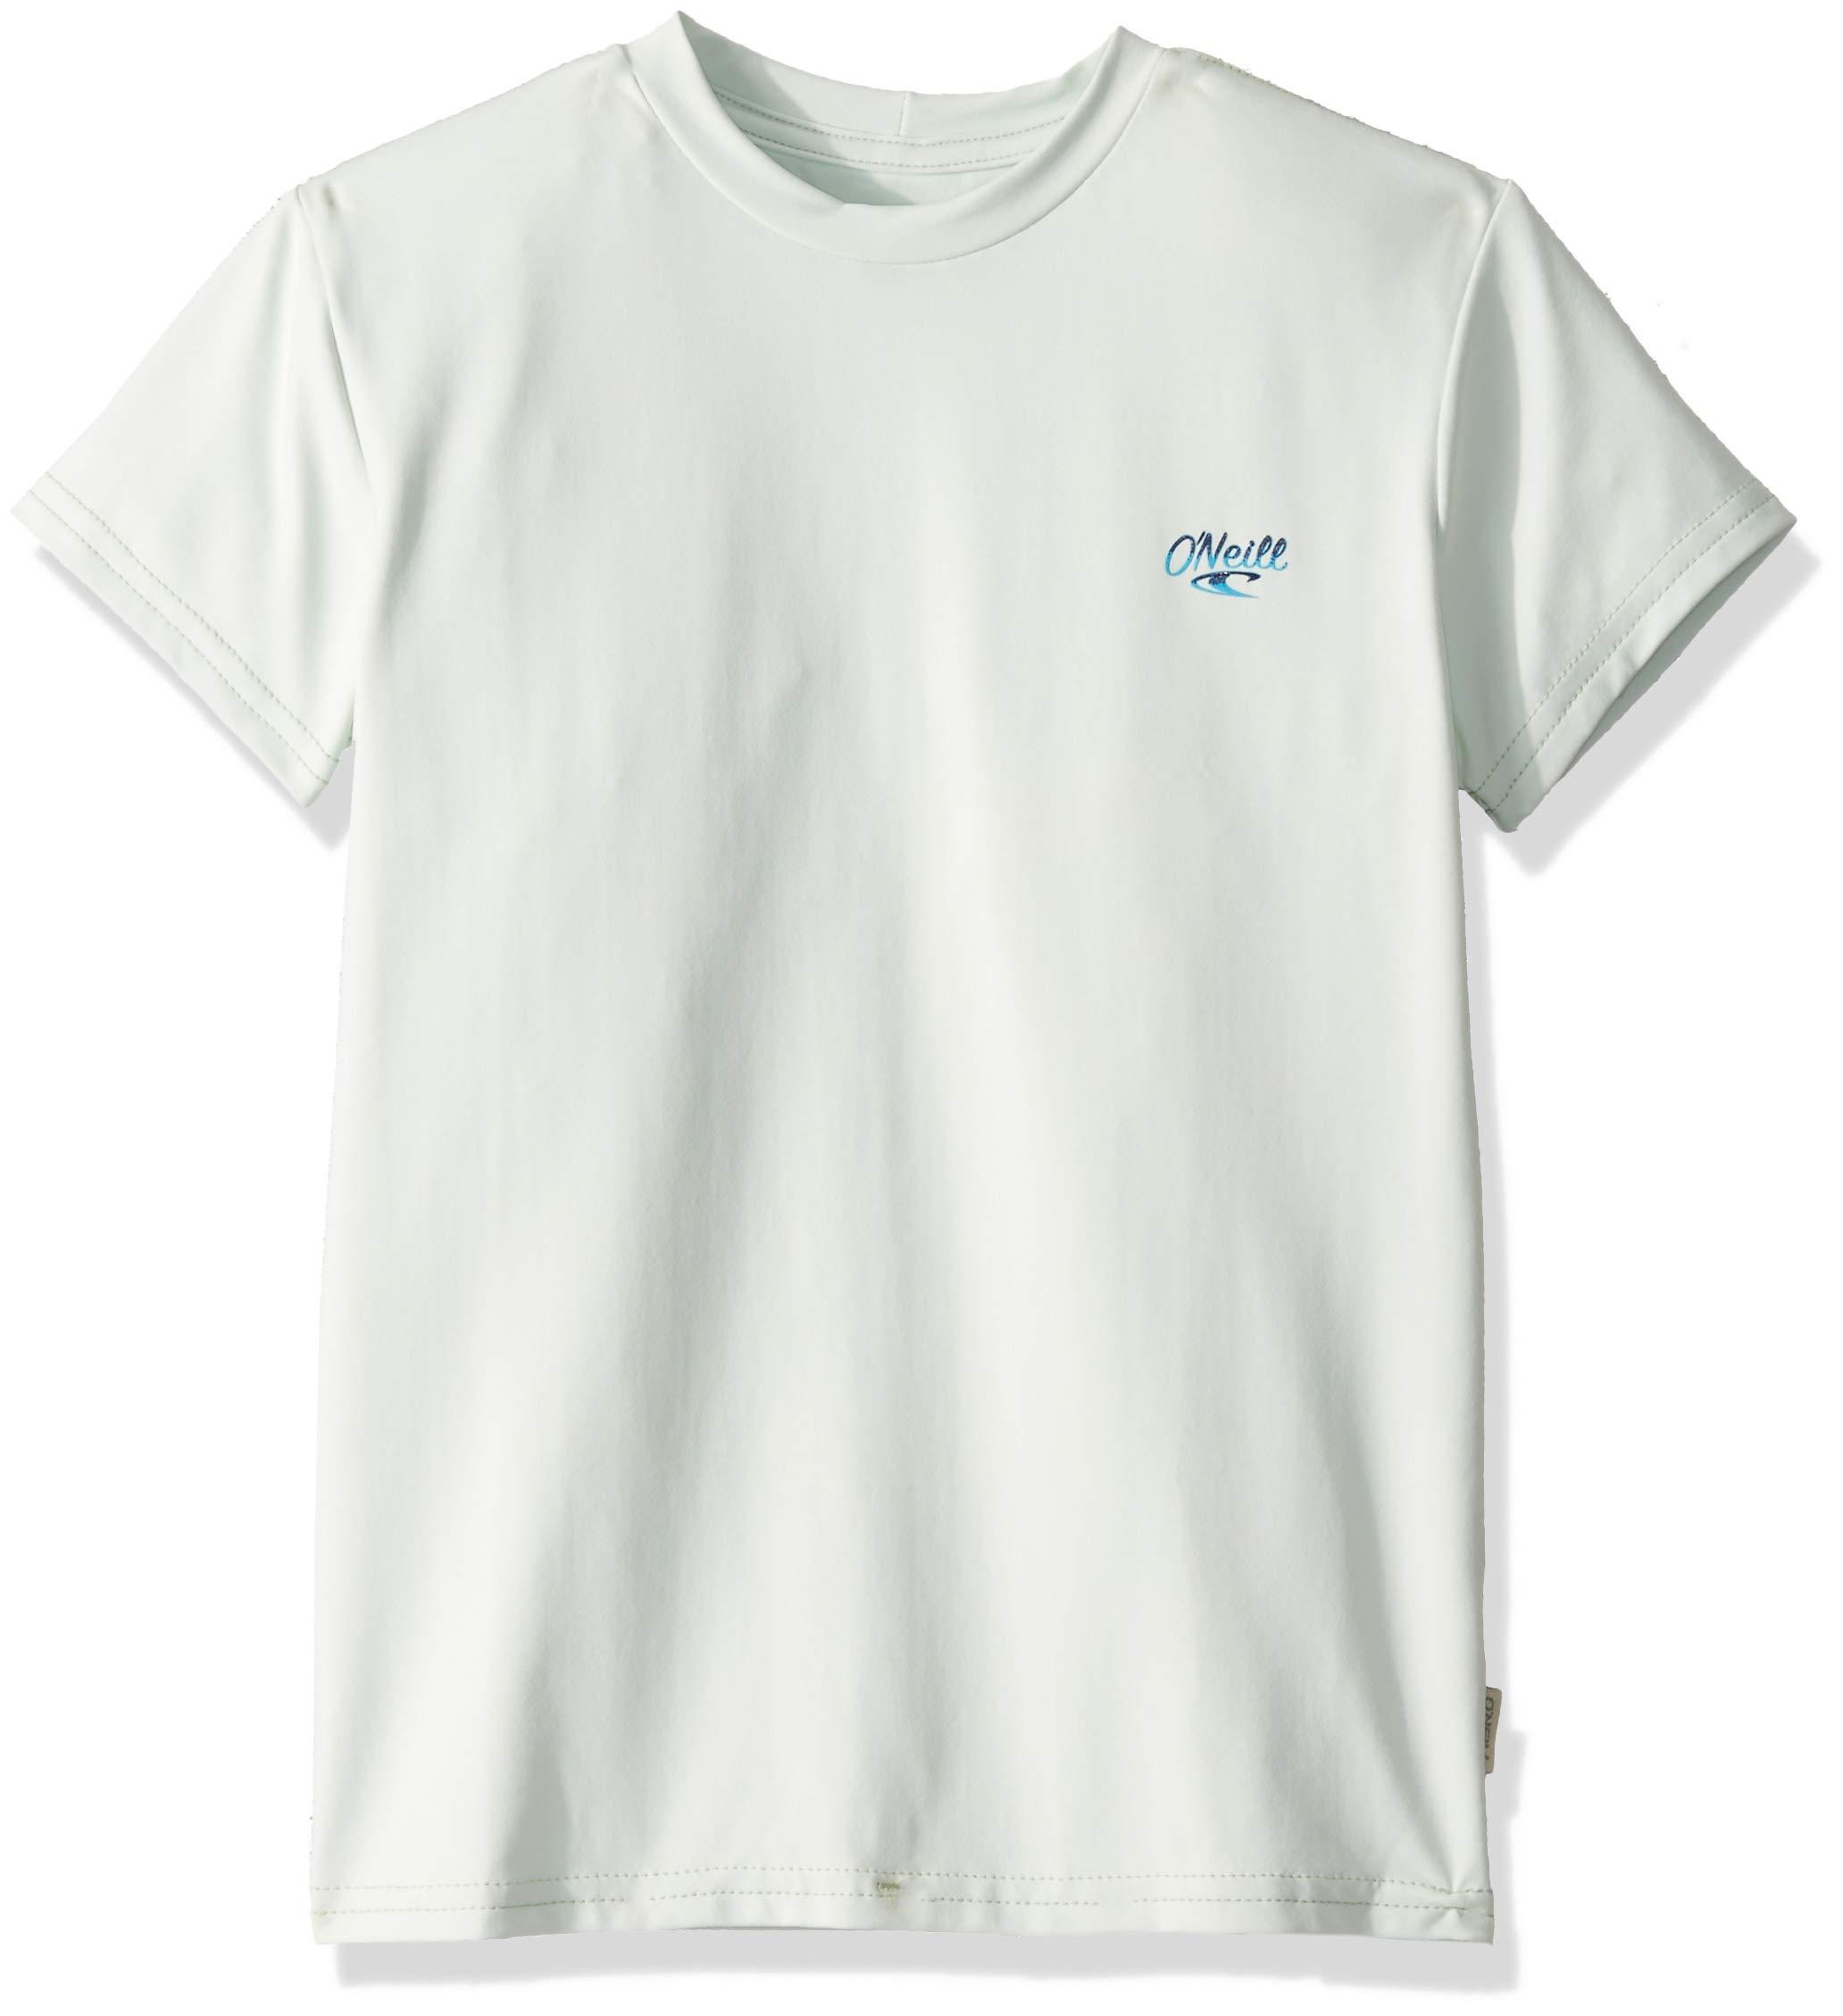 O'Neill Wetsuits Girl's Premium Skins Short Sleeve Sun Shirt, Fresh Mint, Size 16 by O'Neill Wetsuits